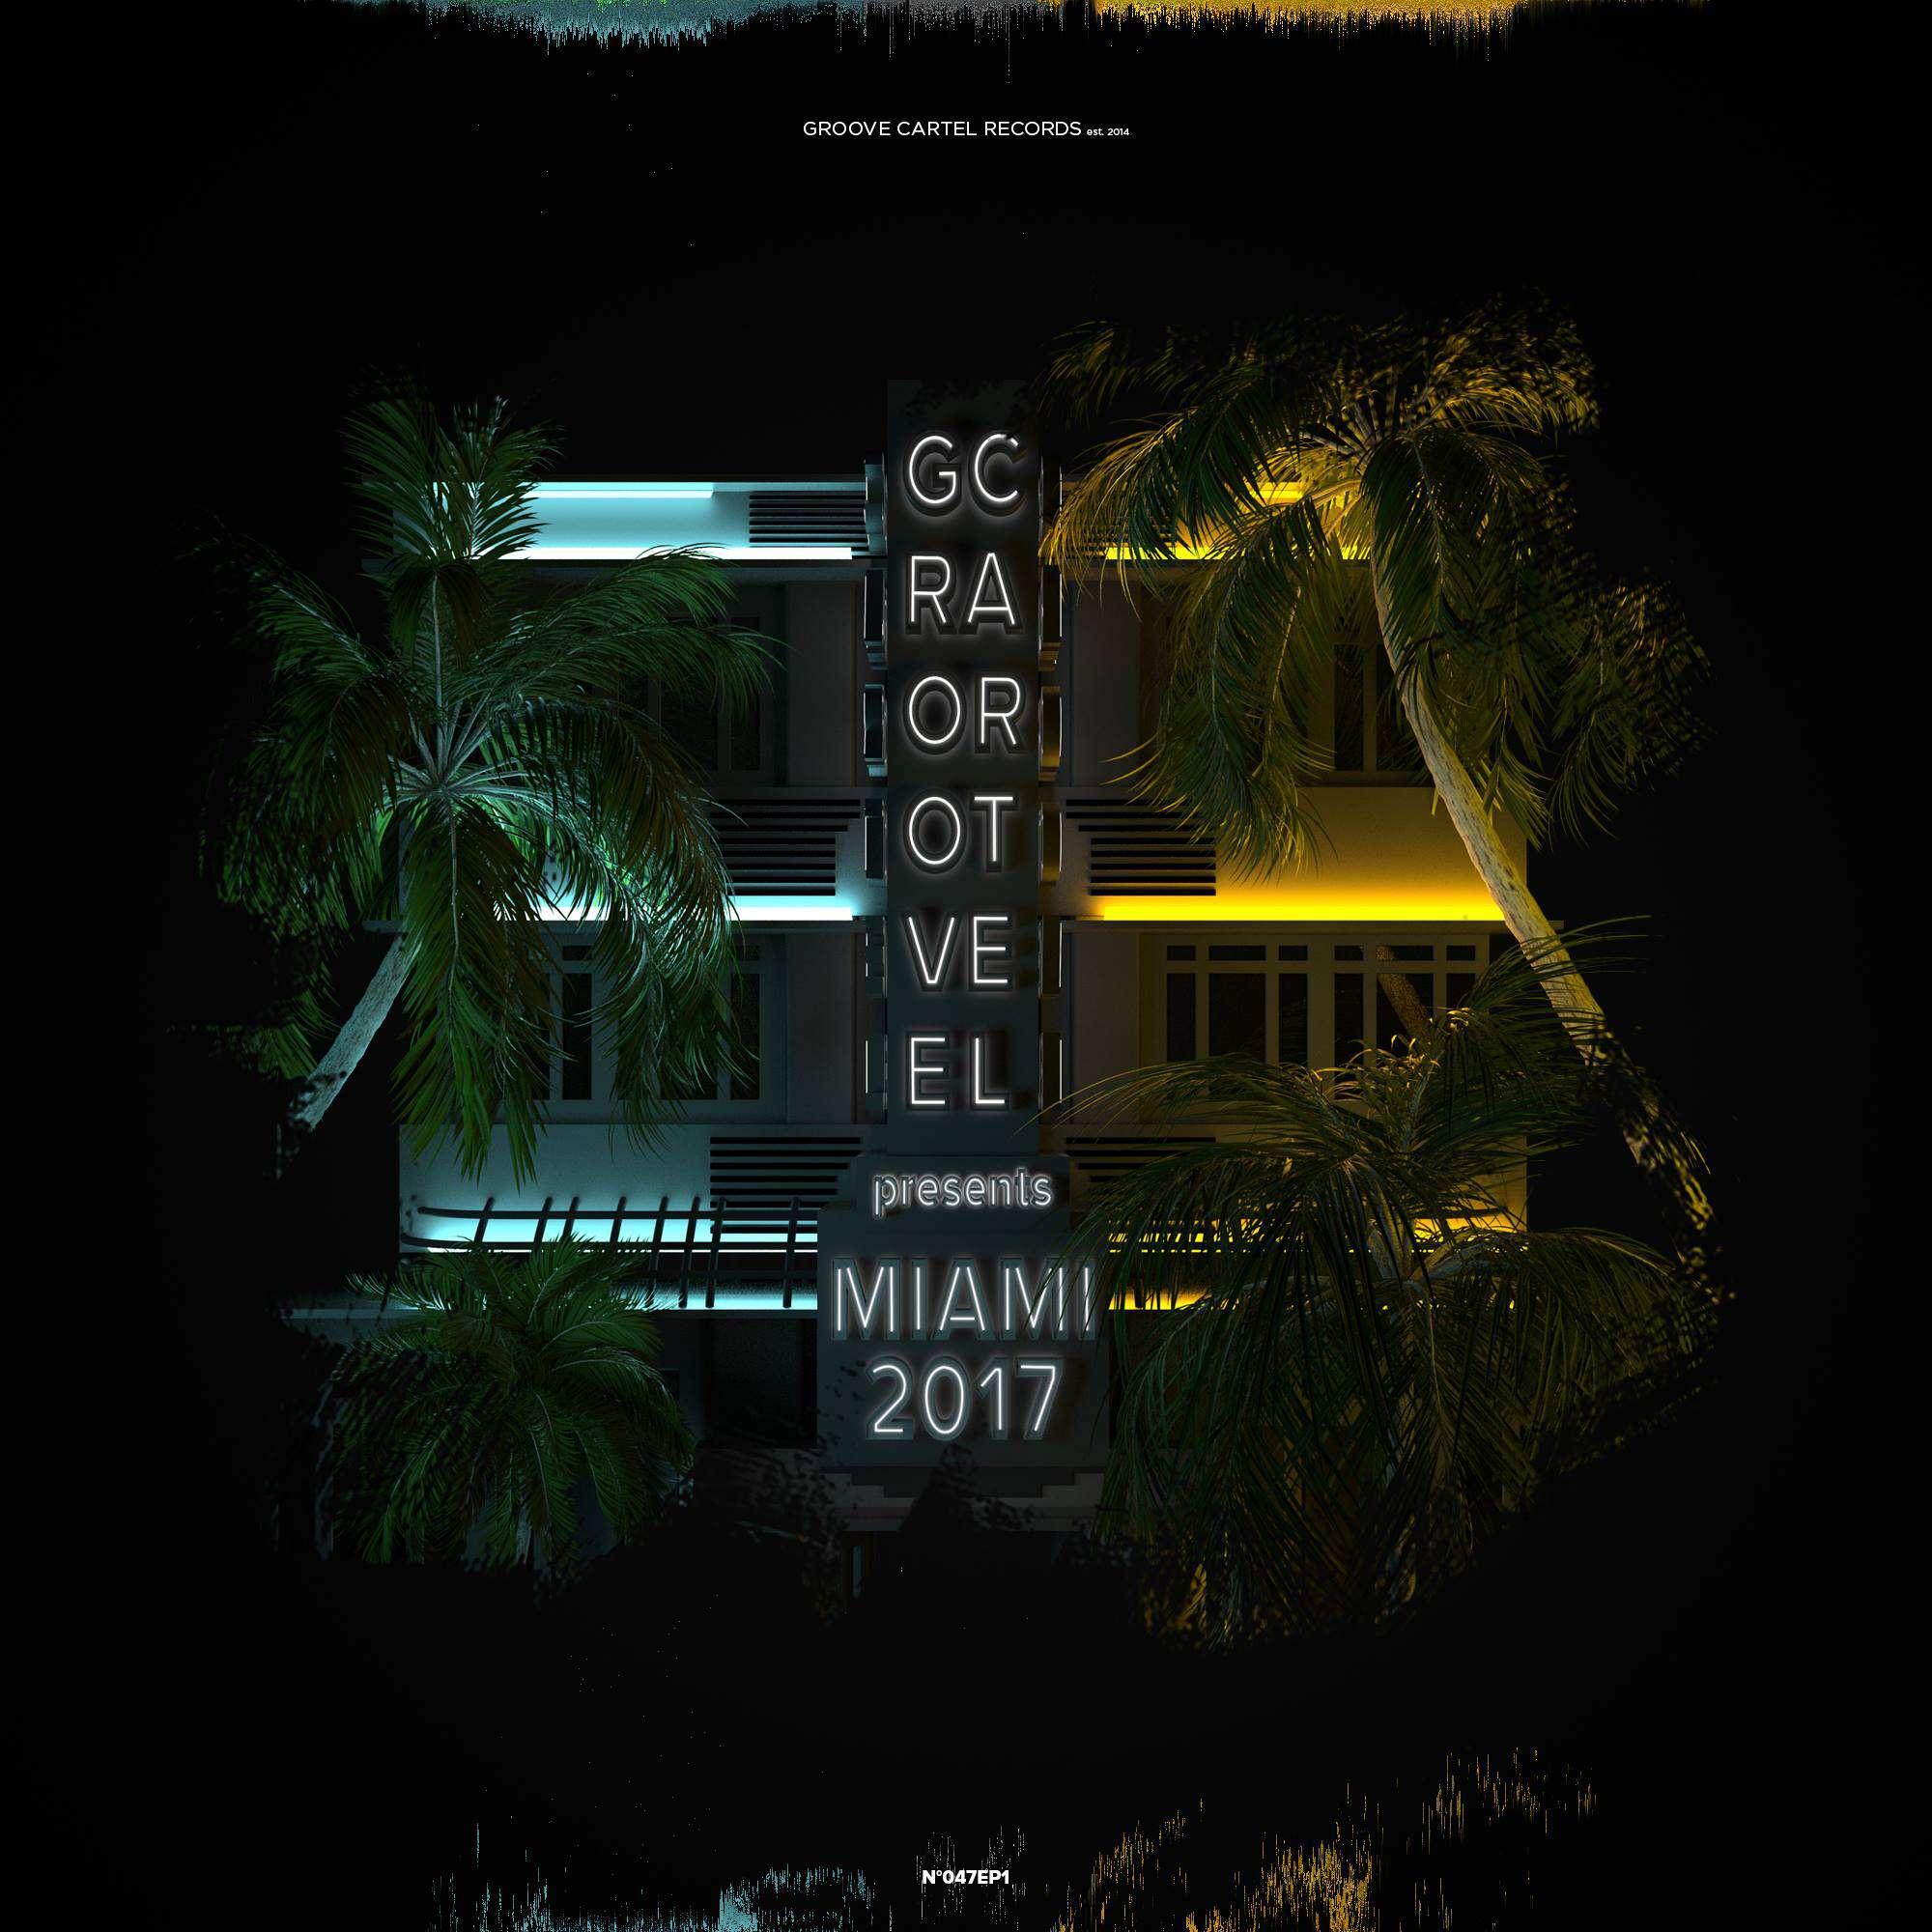 Groove Cartel presents Miami 2017